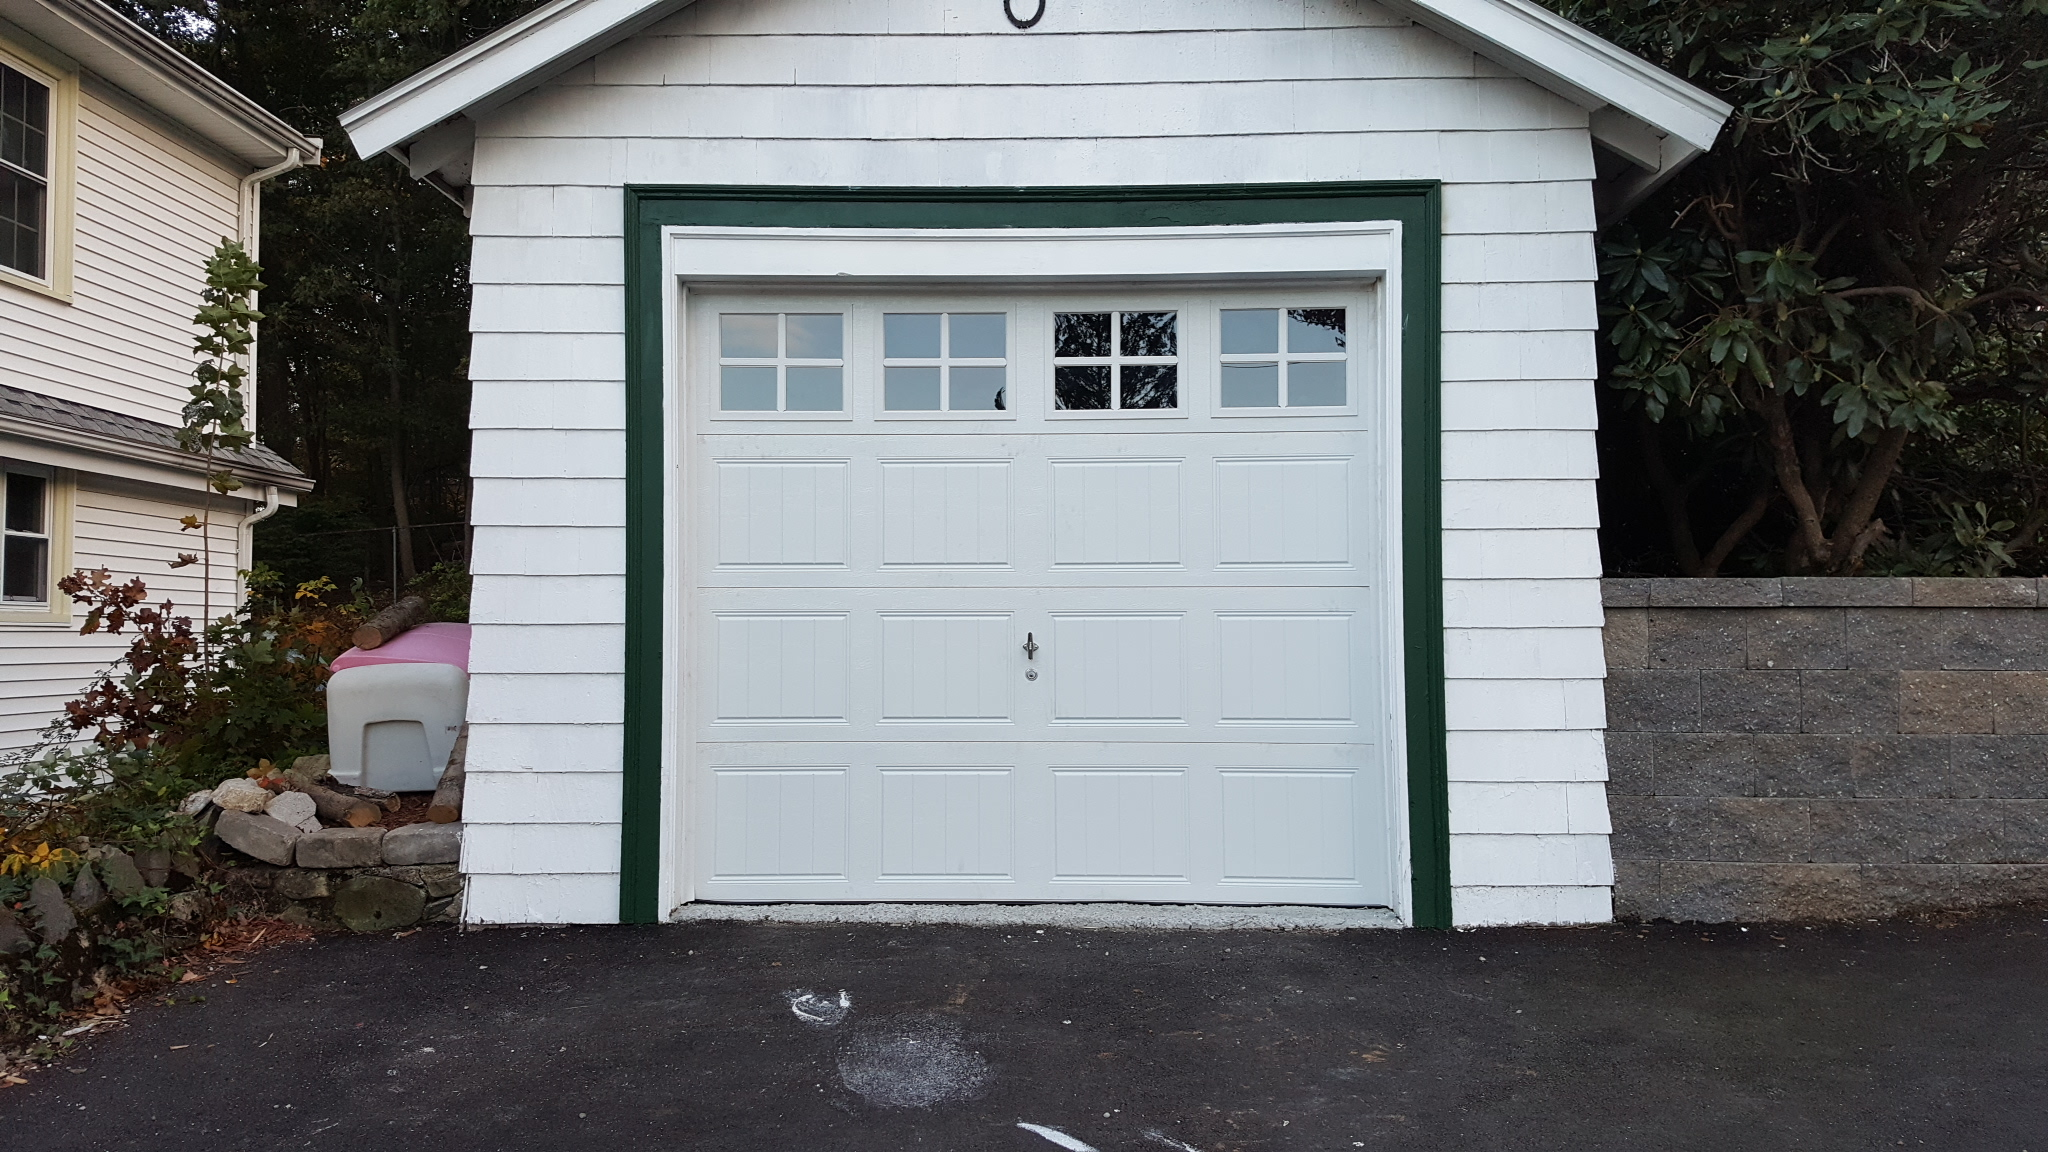 1152 #766855 Mass Garage Doors Expert In Boston Massachusetts 02135 (888) 989  image Usa Garage Doors 36132048